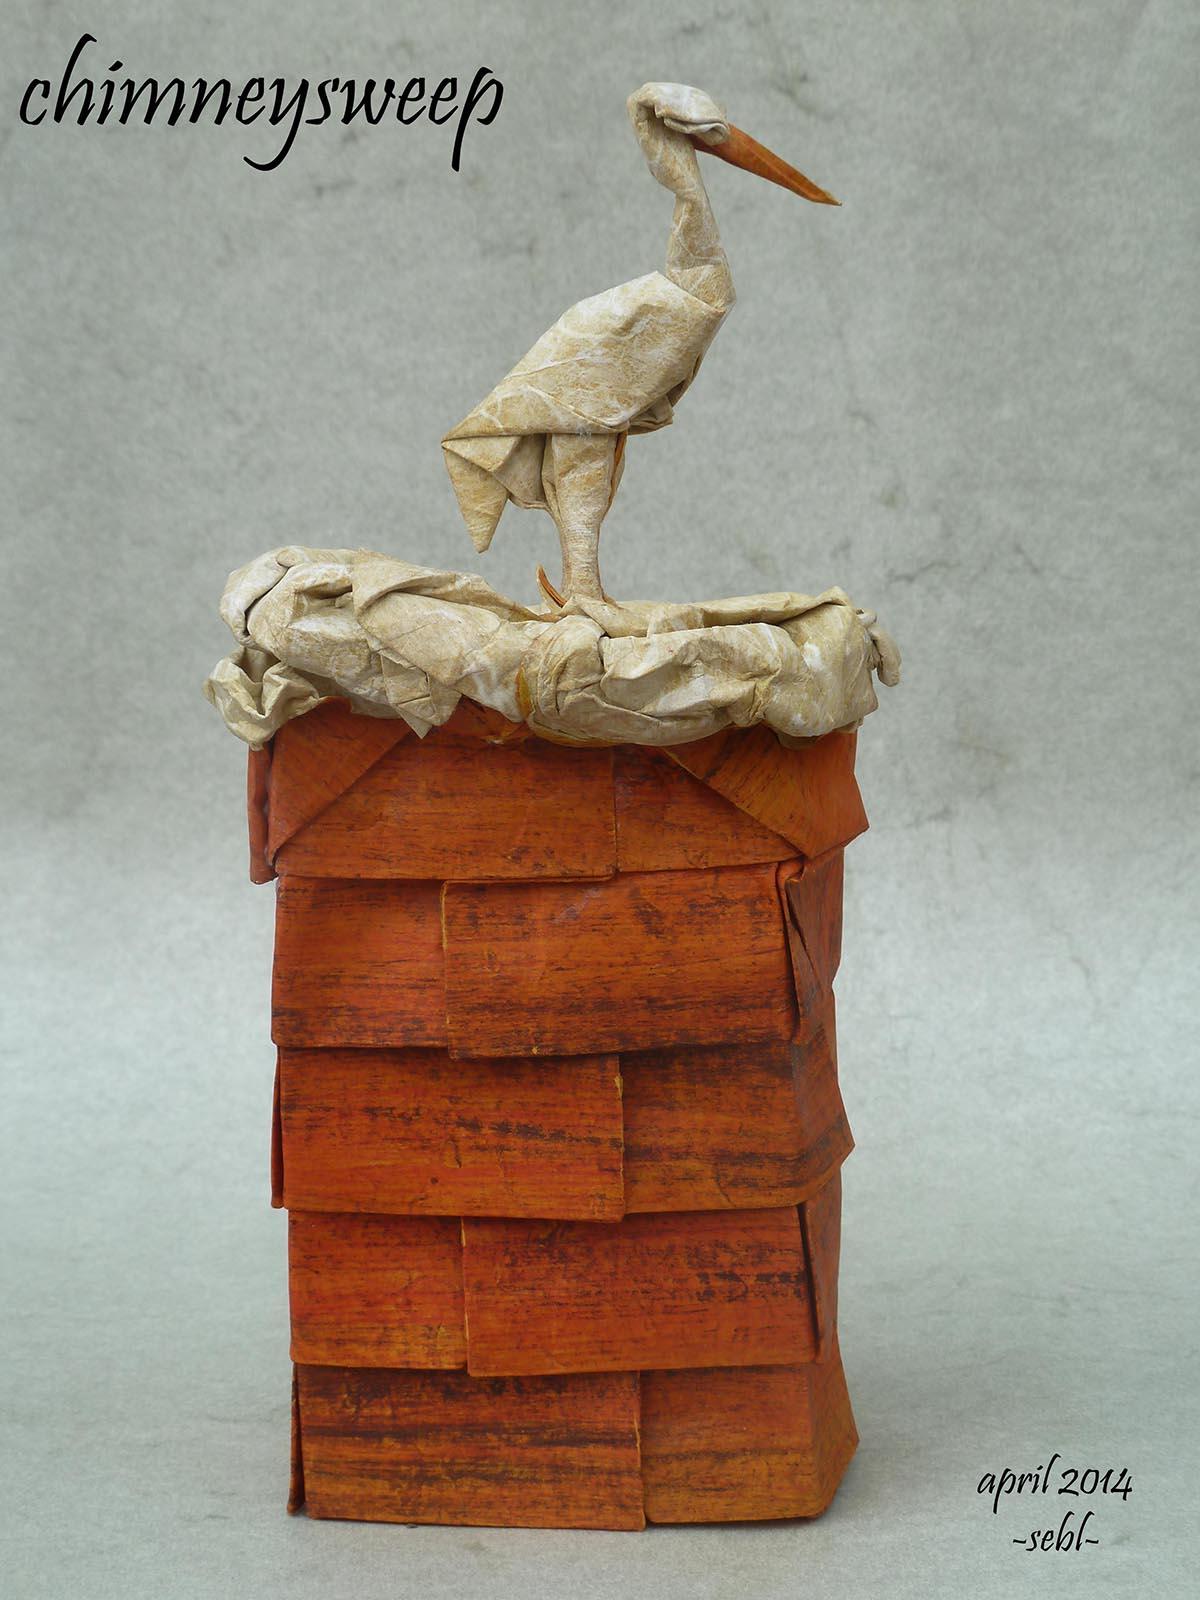 Chimney Sweep Bird by Sebastien Limet